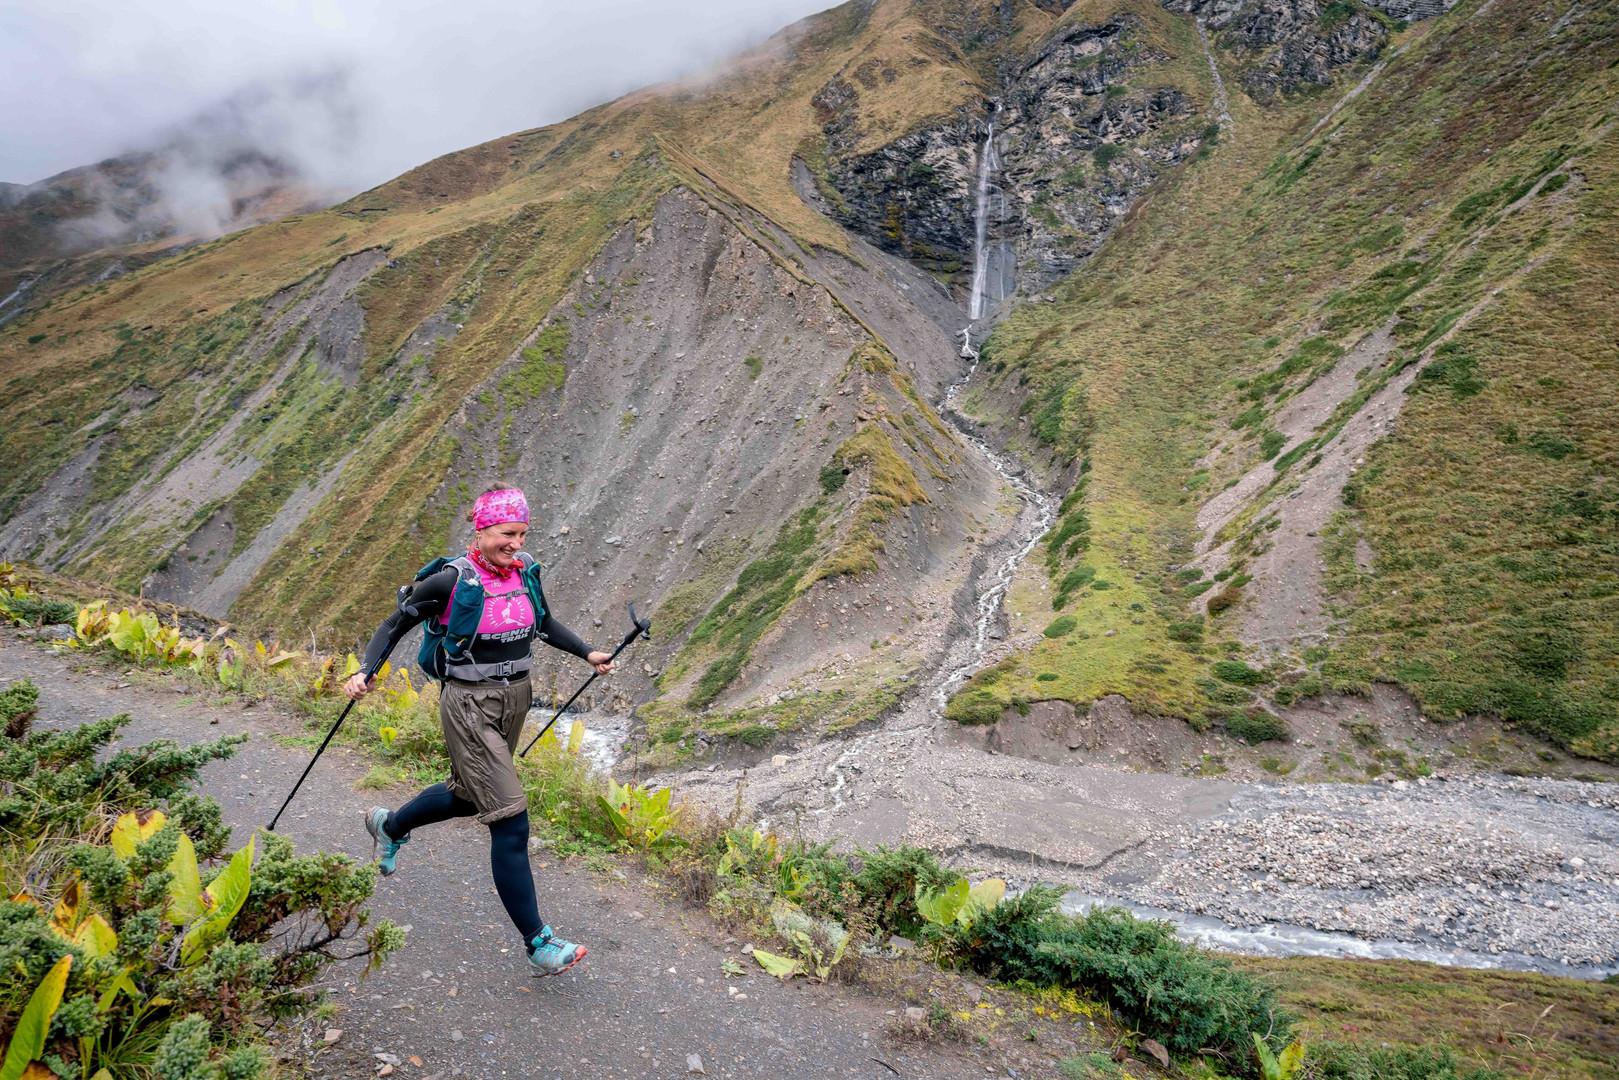 Moira running in the Himalayas